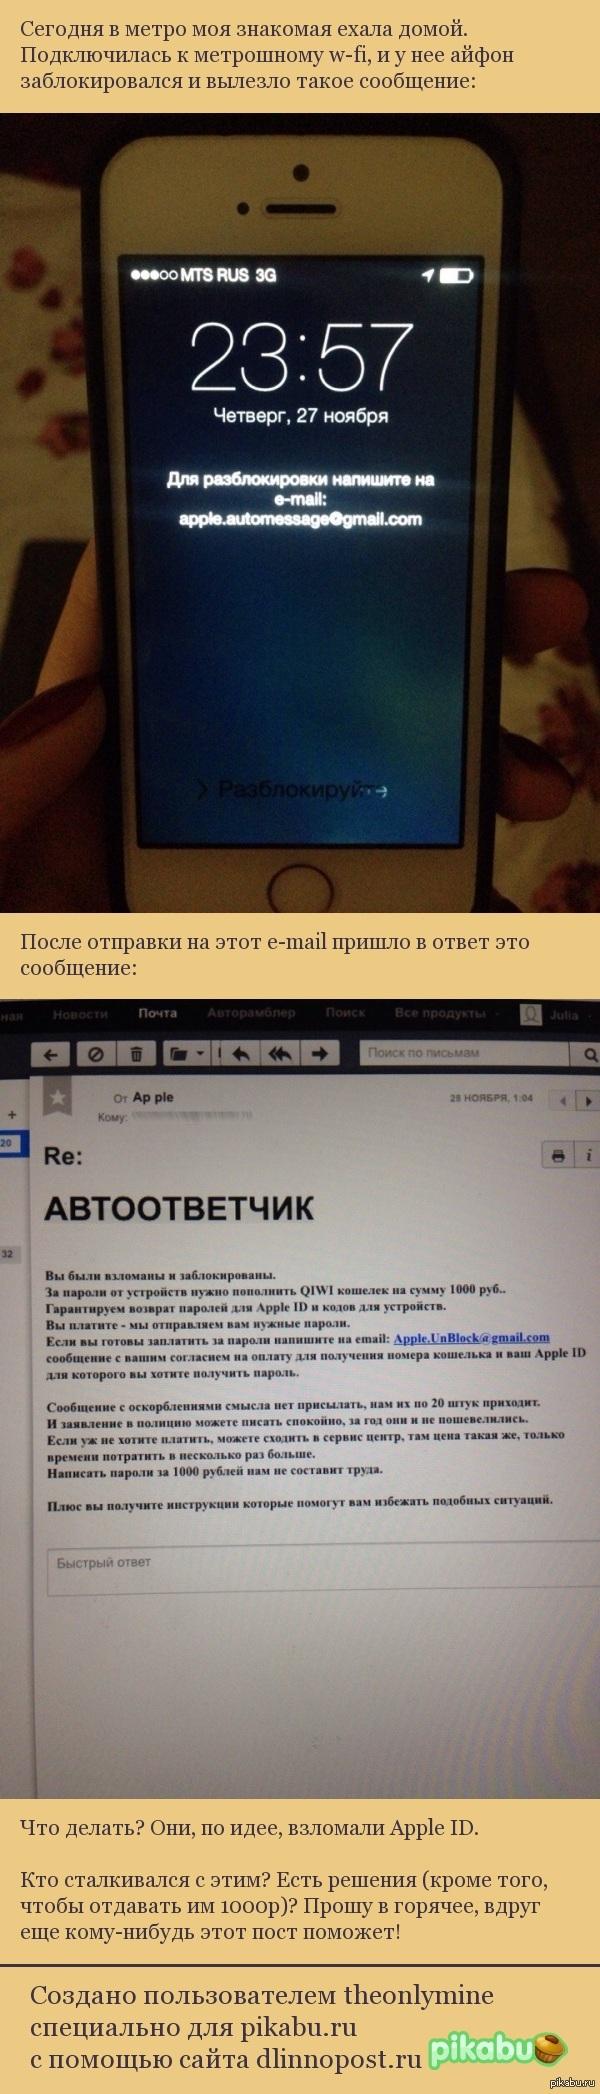 WatchDogs � ������? ��� ��������� � ���� �������� ������� � ����� �� ���� �����  iphone, ������, apple, apple id, ����������